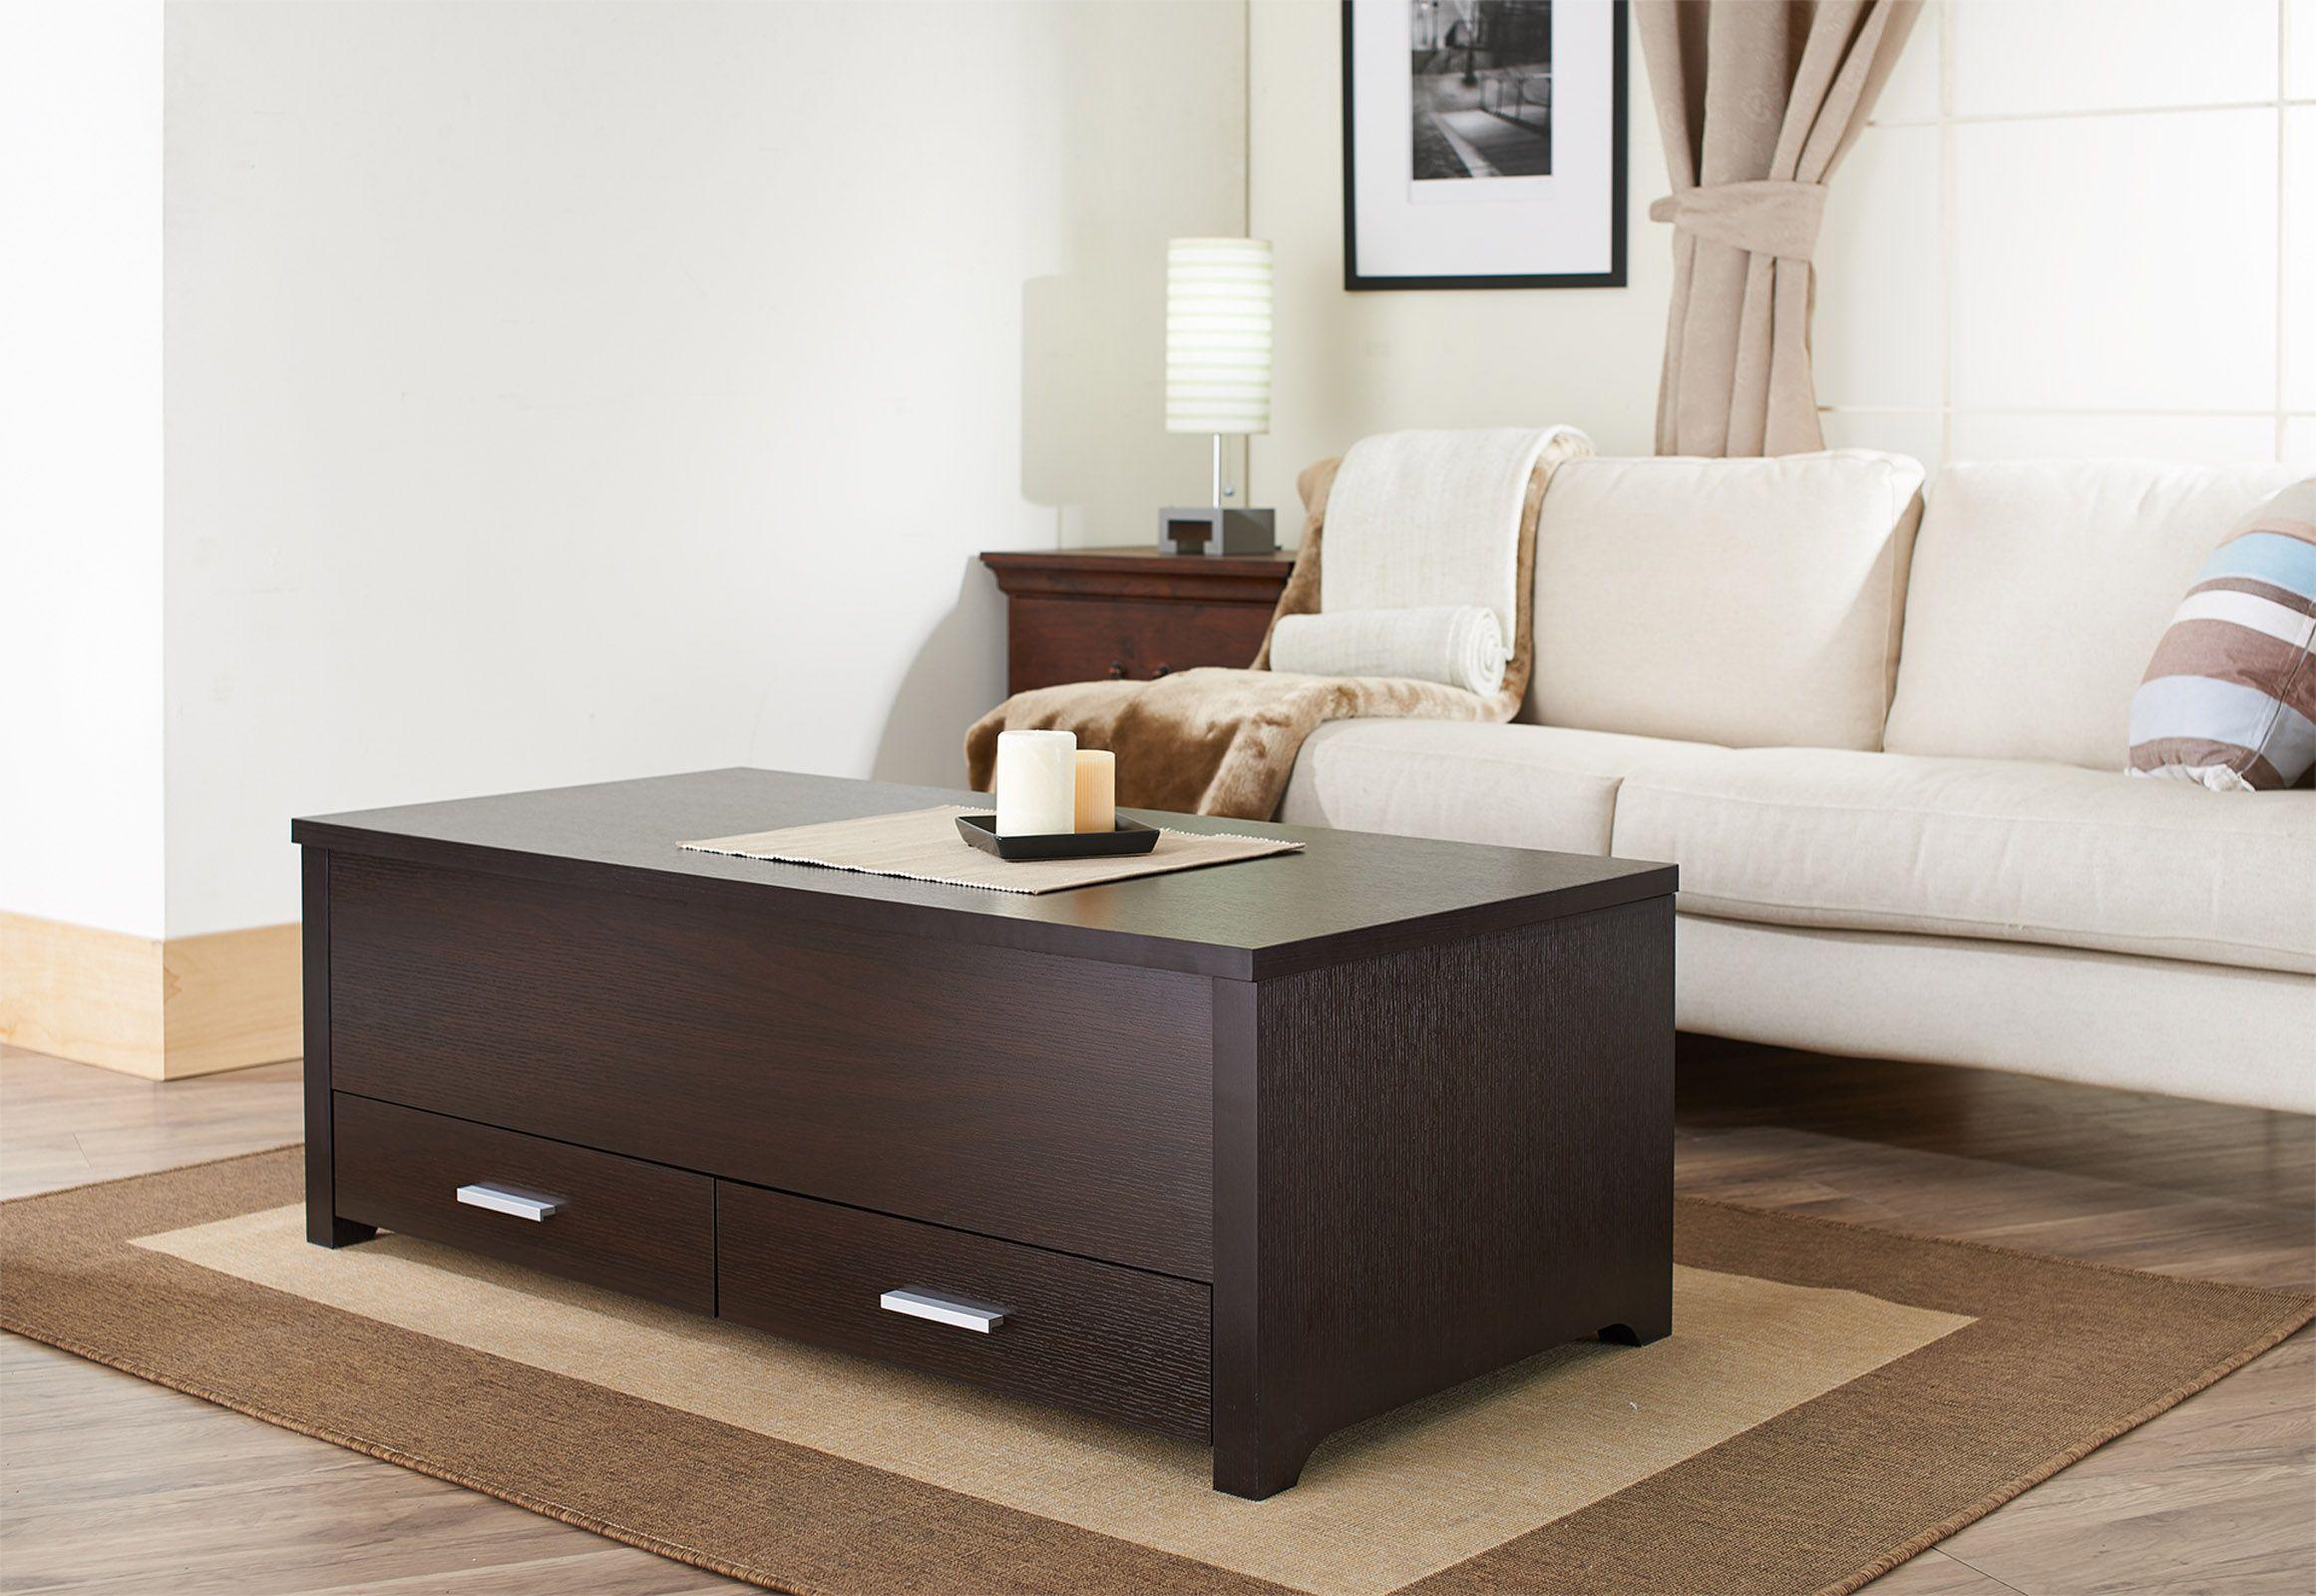 Furniture of America Garla Espresso Inner Storage 2-Drawer Coffee Table, Brown